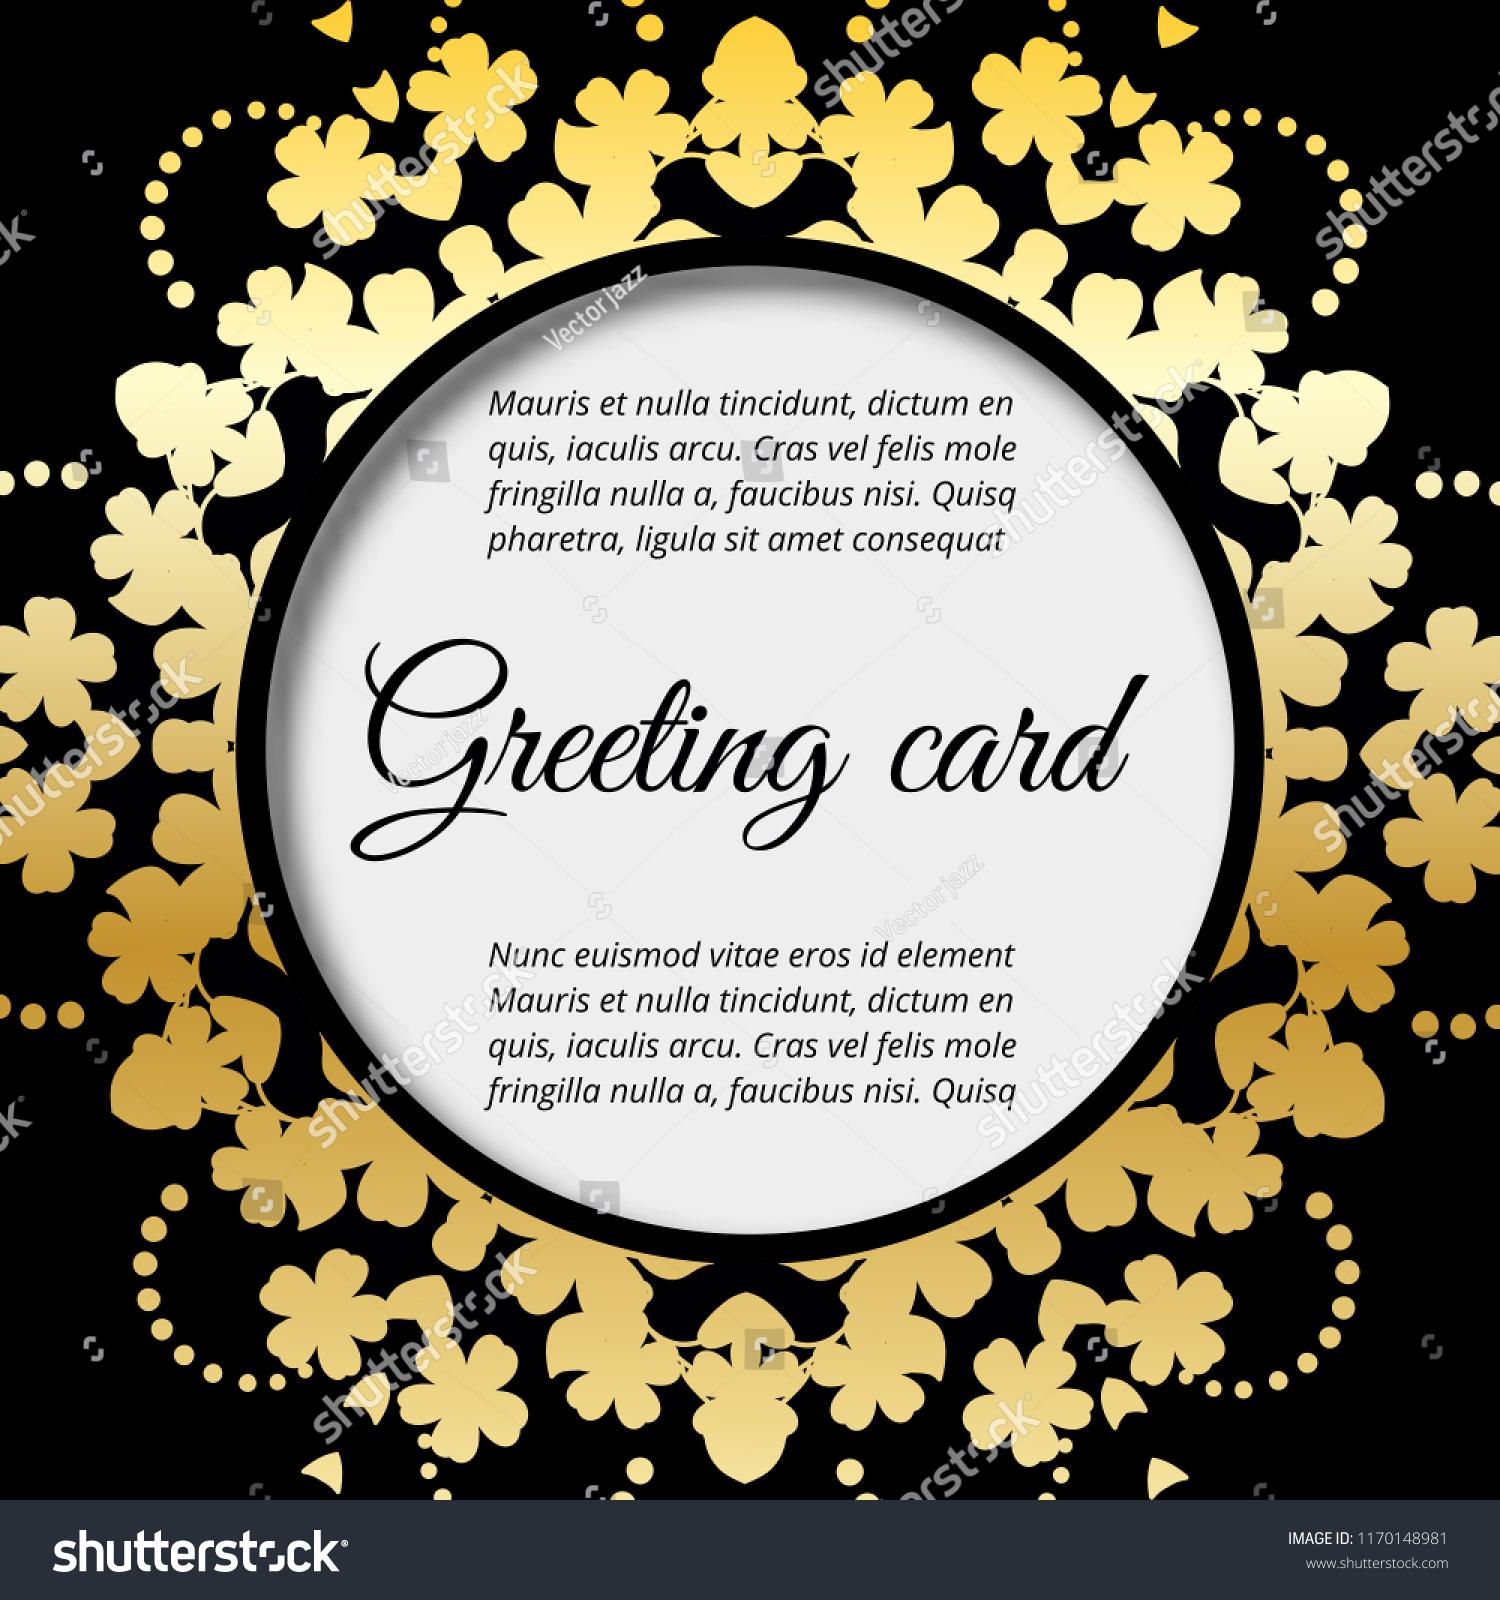 Greeting card, floral wedding felicitation elegant invite, thank.